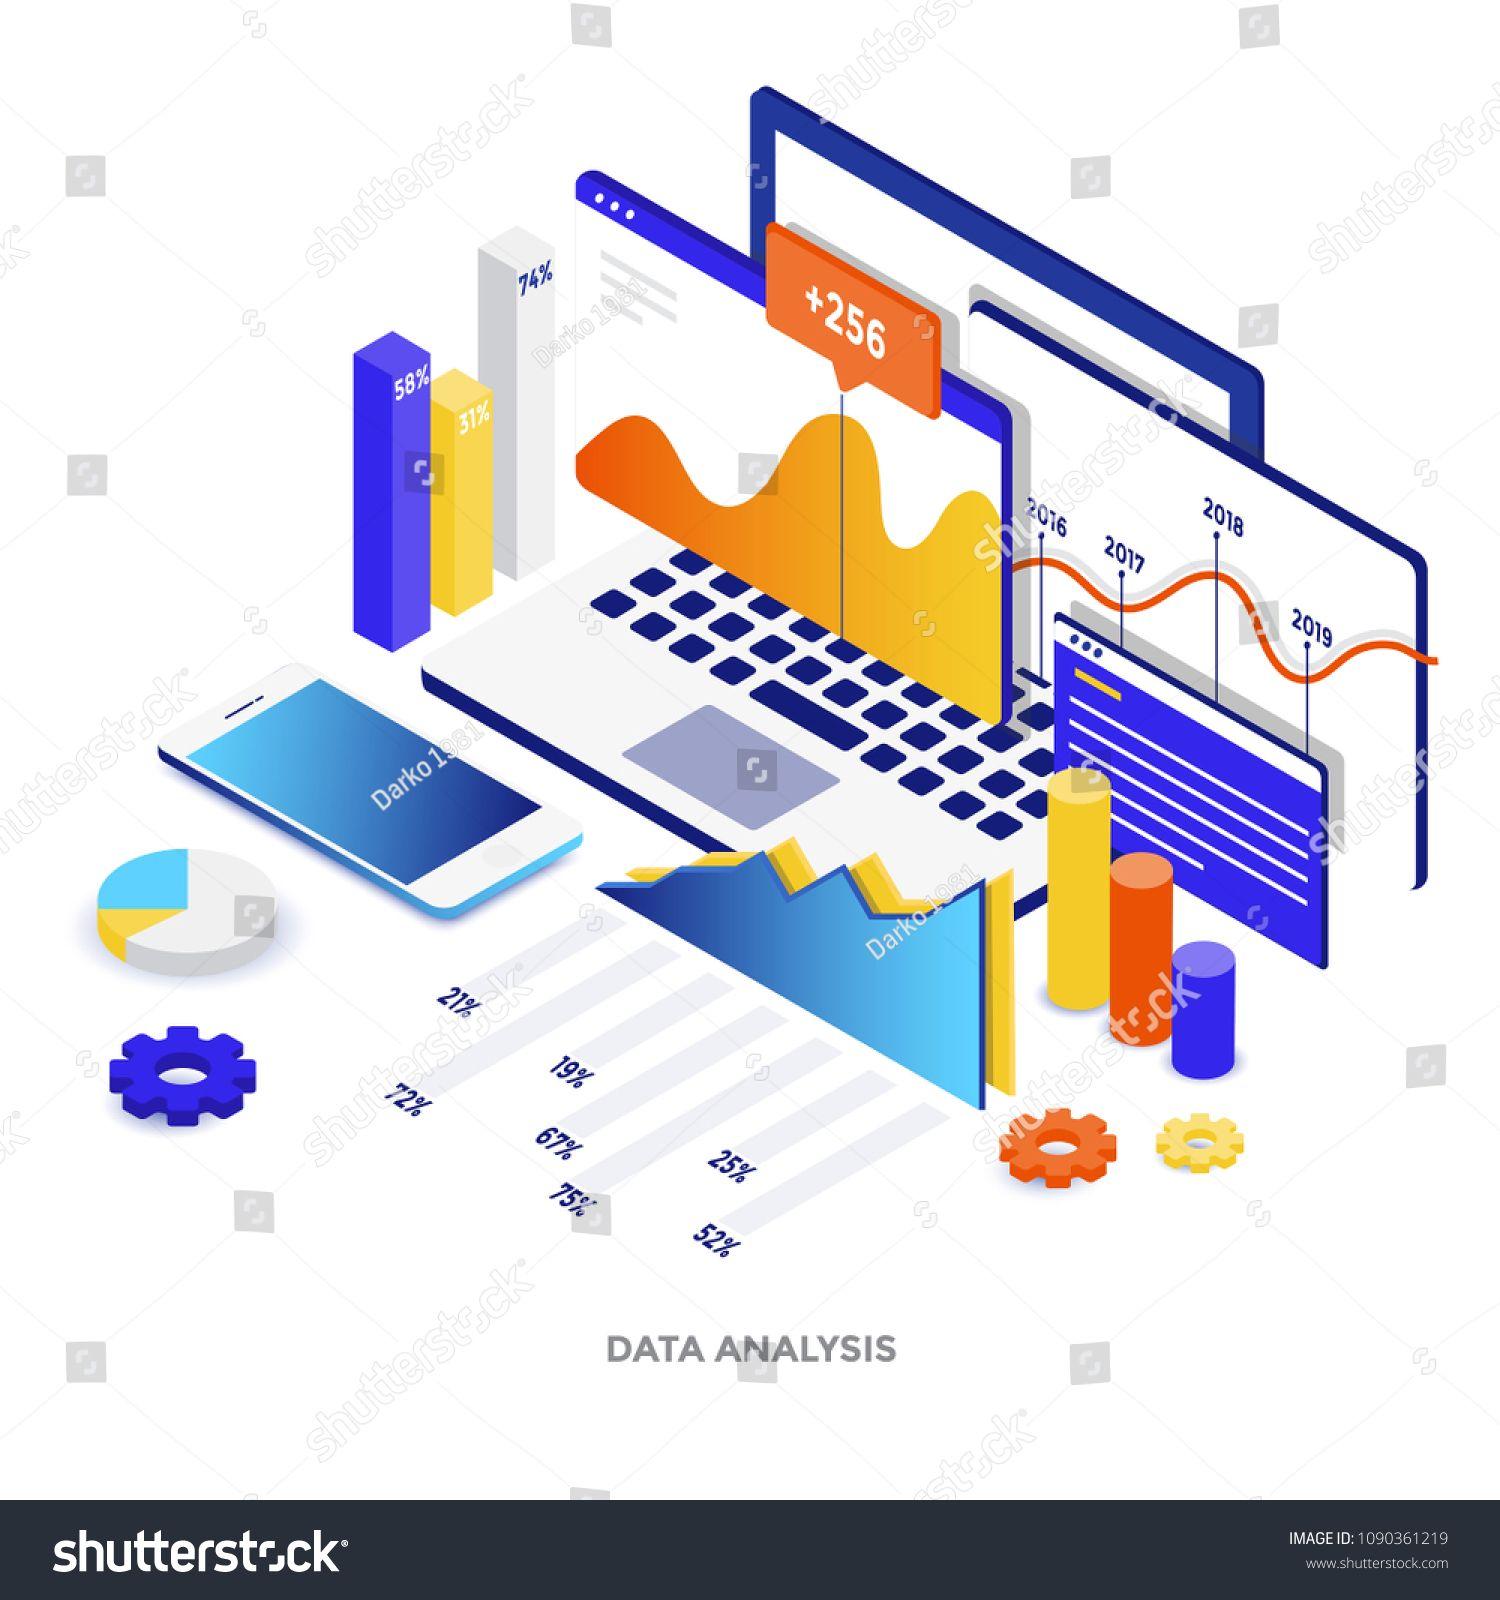 Modern Flat Design Isometric Illustration Of Data Analysis Can Be